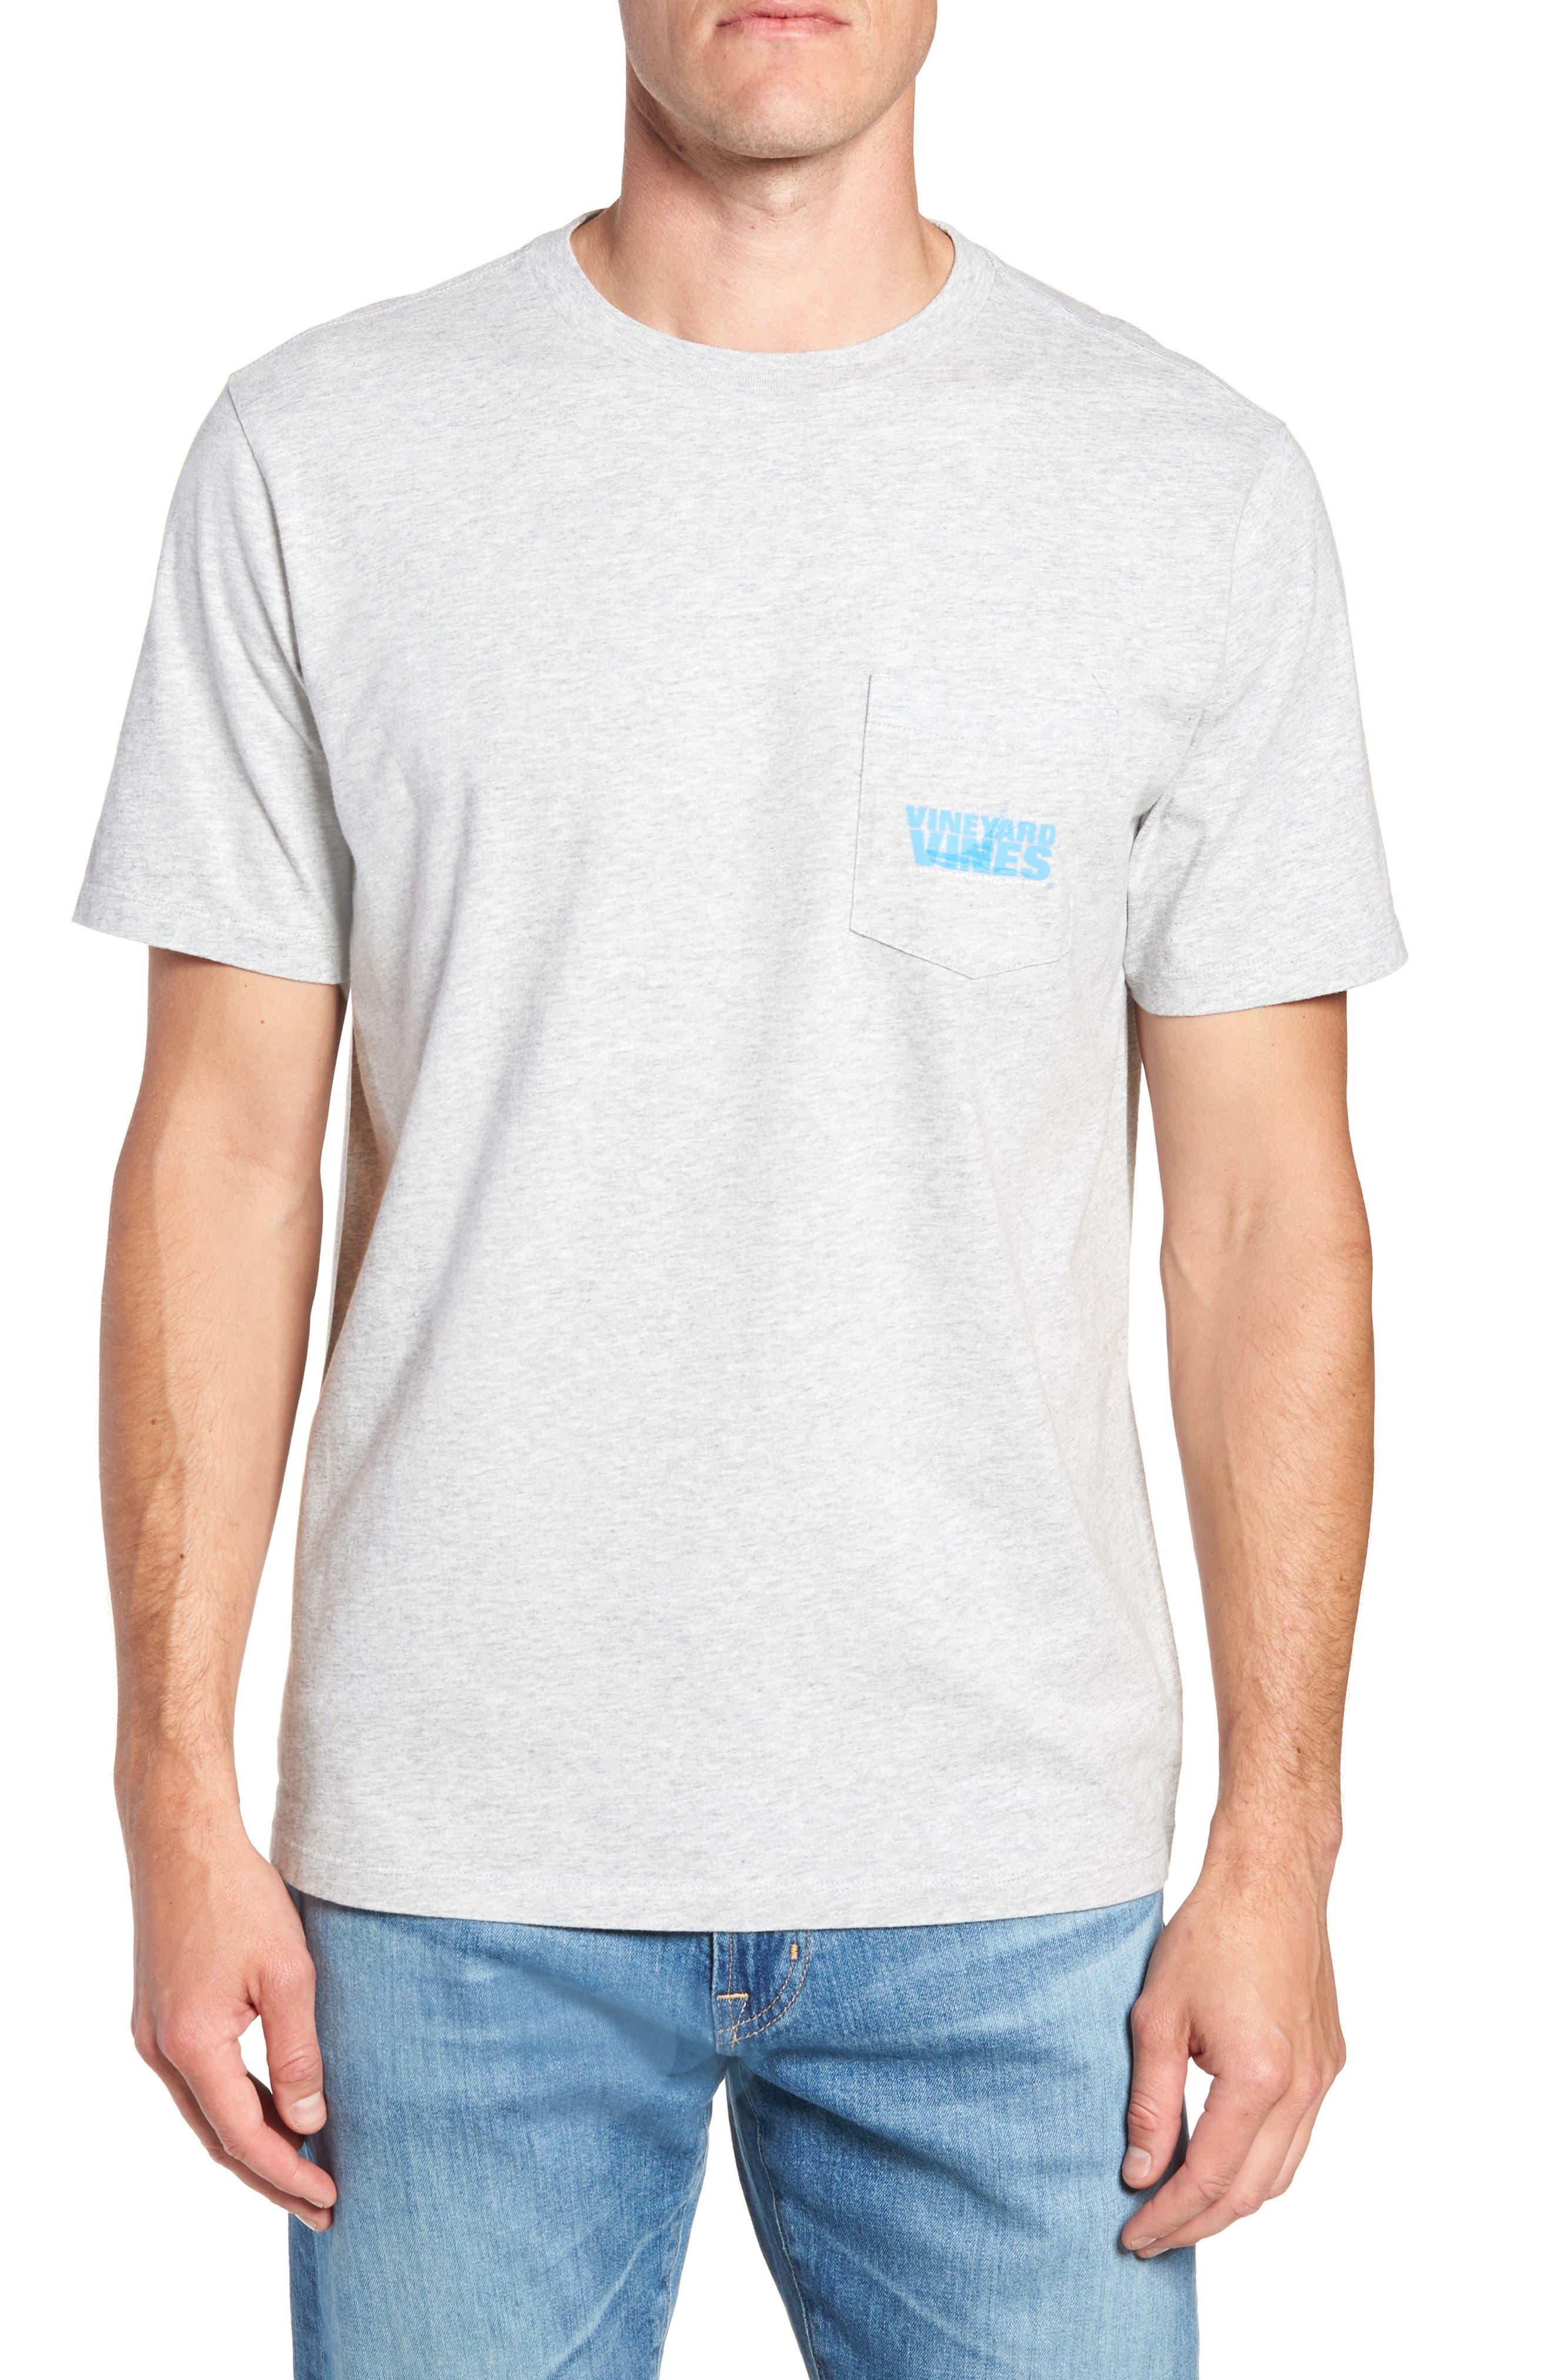 Knockout Sportfisher T-Shirt,                             Main thumbnail 1, color,                             GRAY HEATHER